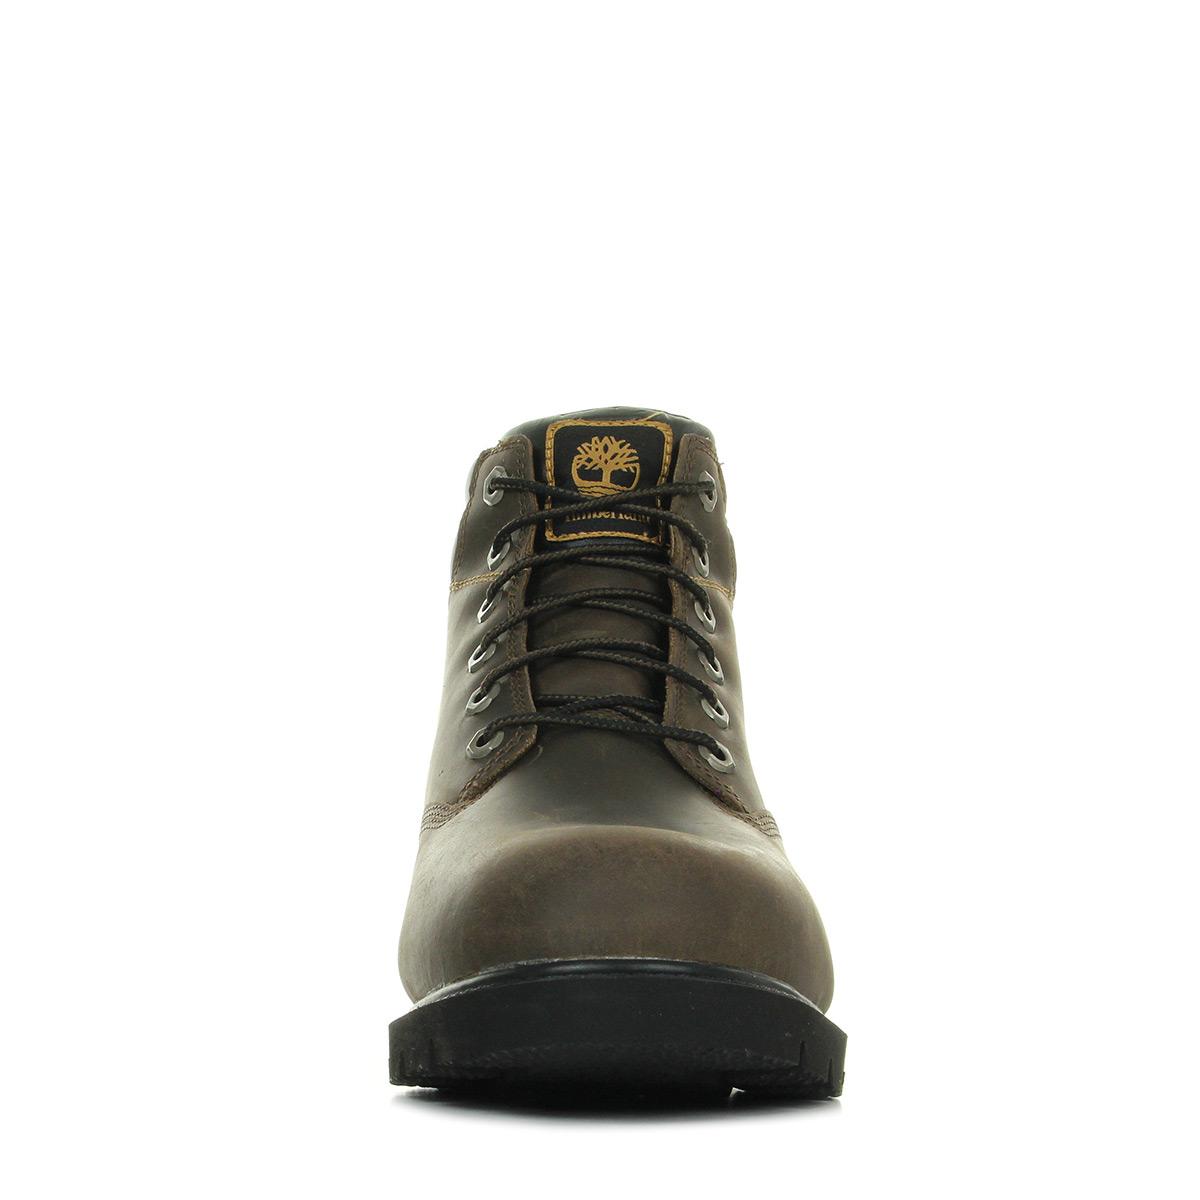 Timberland Leavitt Waterproof Lace Boot Dark Brown CA1K94, Boots homme f90985bde87c